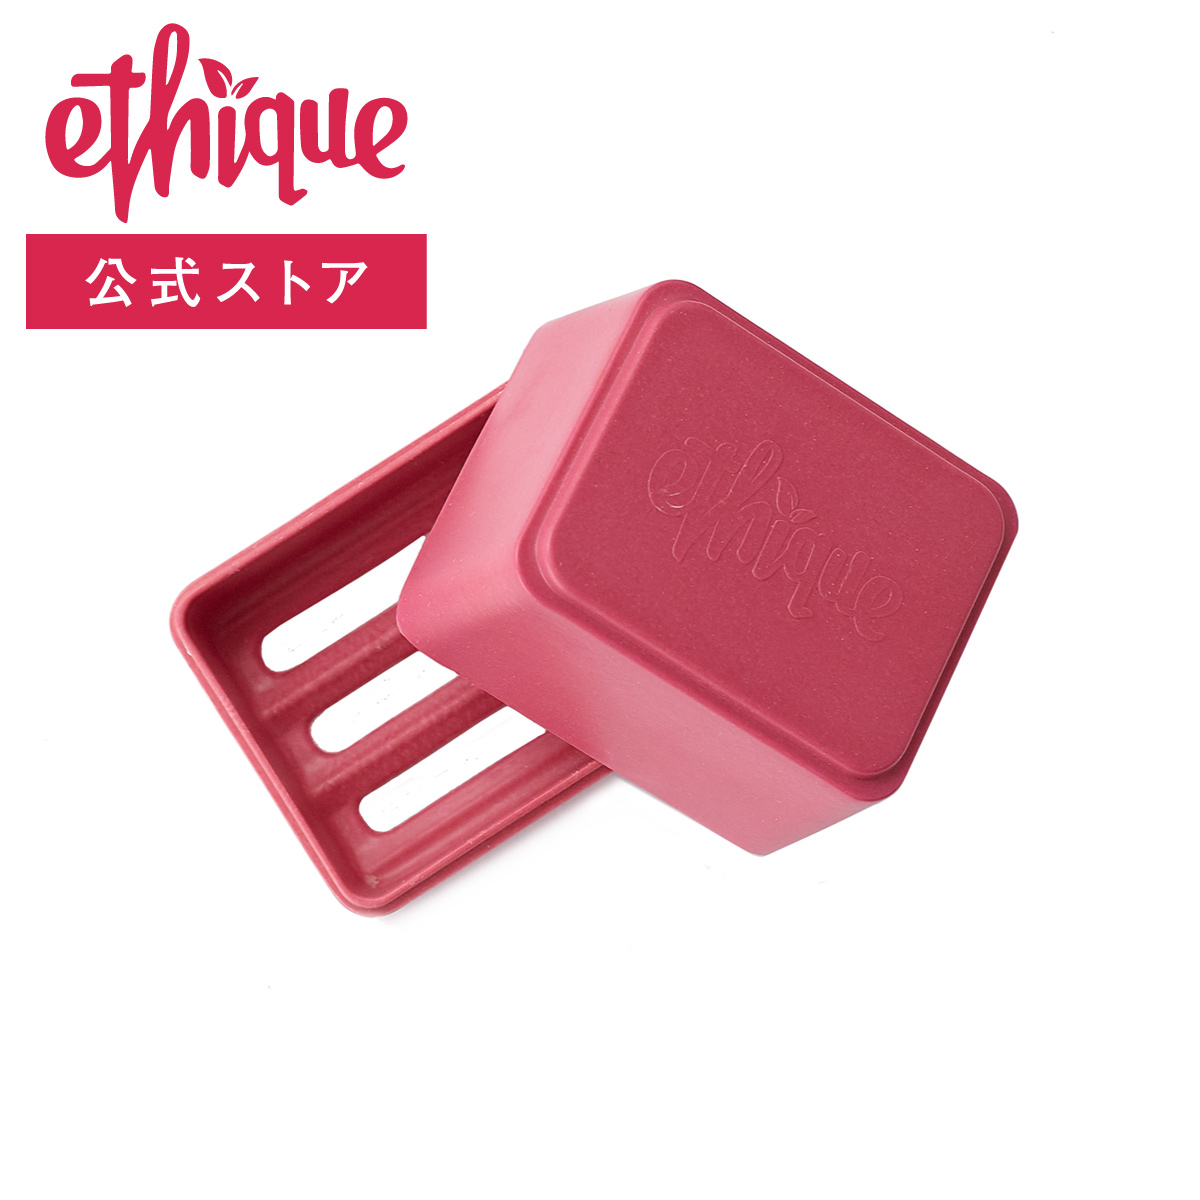 ethique バーコンテナ 公式 エティーク ピンク シャンプー 美容室専売石鹸シャンプー 石鹸置き 石鹸おき ソープディッシュ ソープホルダー 石鹸 選択 せっけん 皿 かわいい ソープ おしゃれ 固形シャンプー 石けん 雑貨 水切り 置き 台 受け 小物 市場